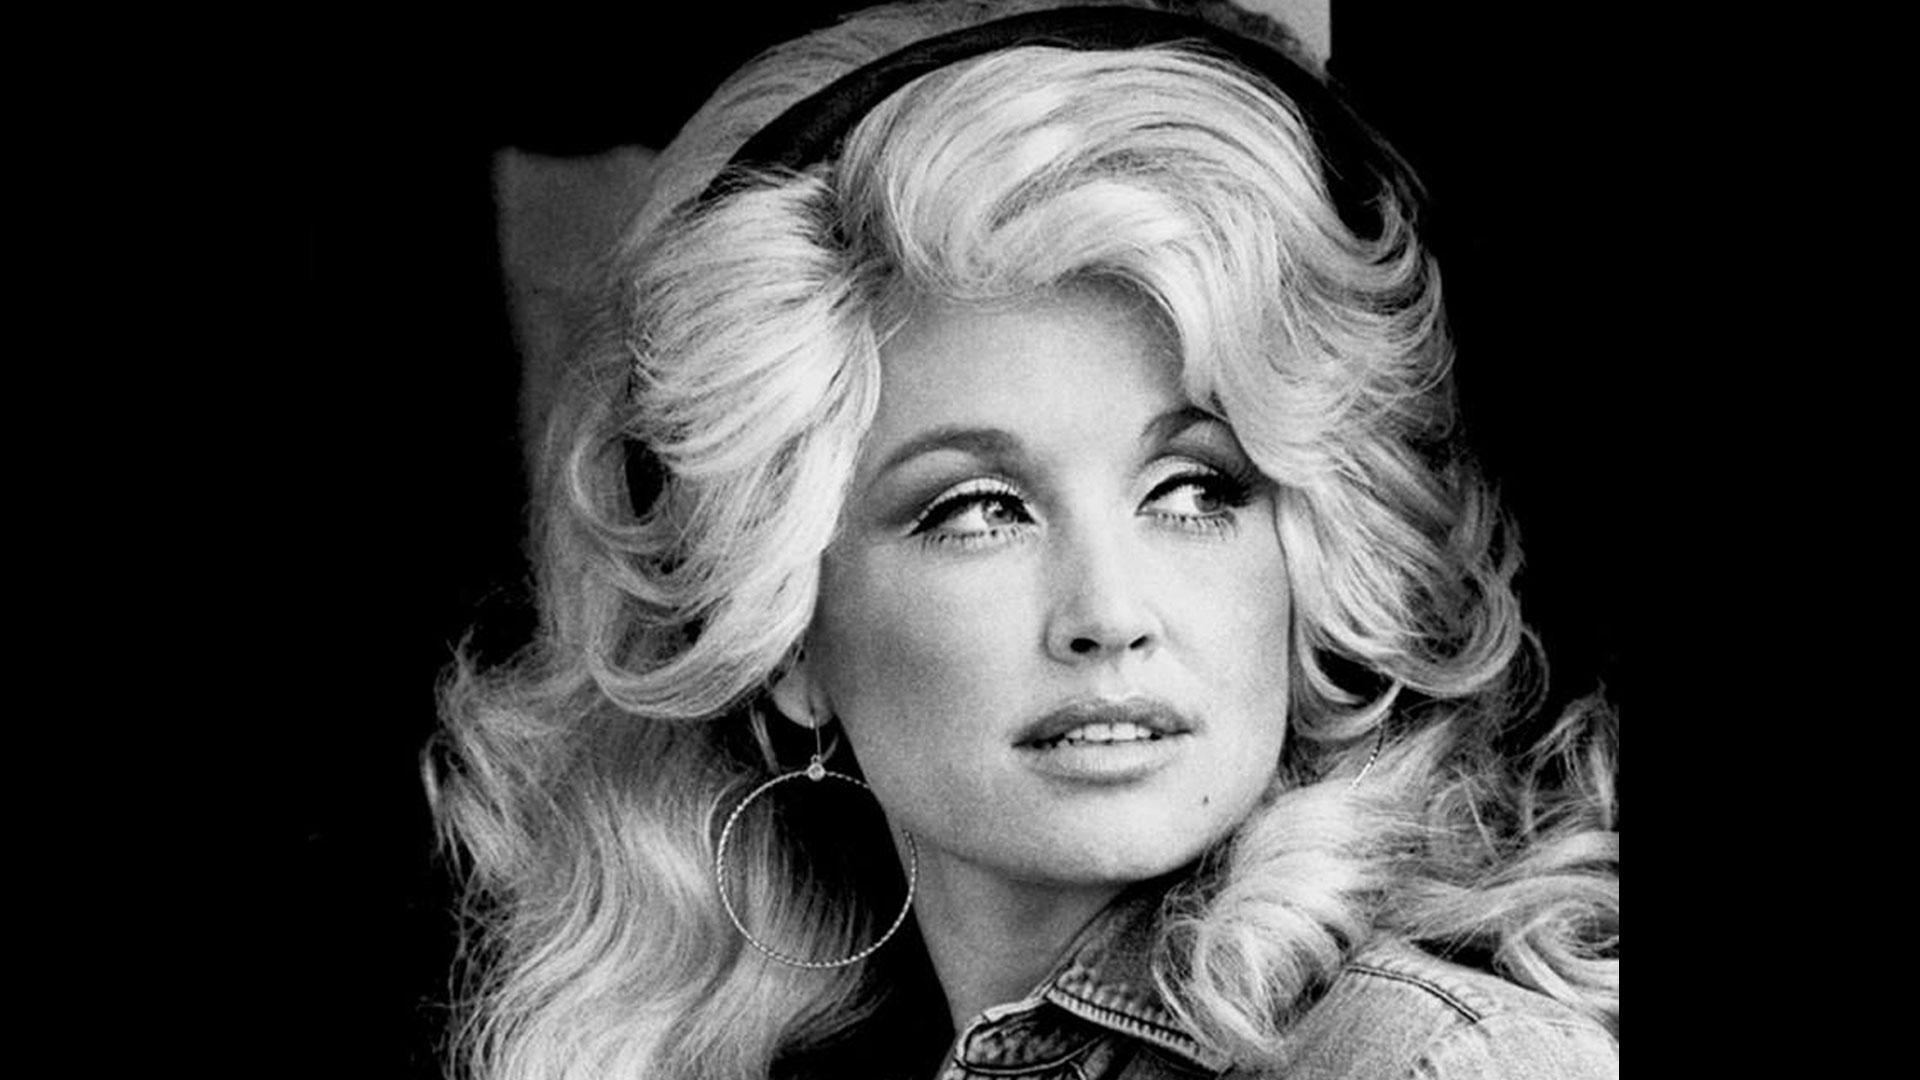 Dolly Parton, 1977 (public domain image, RCA Records)